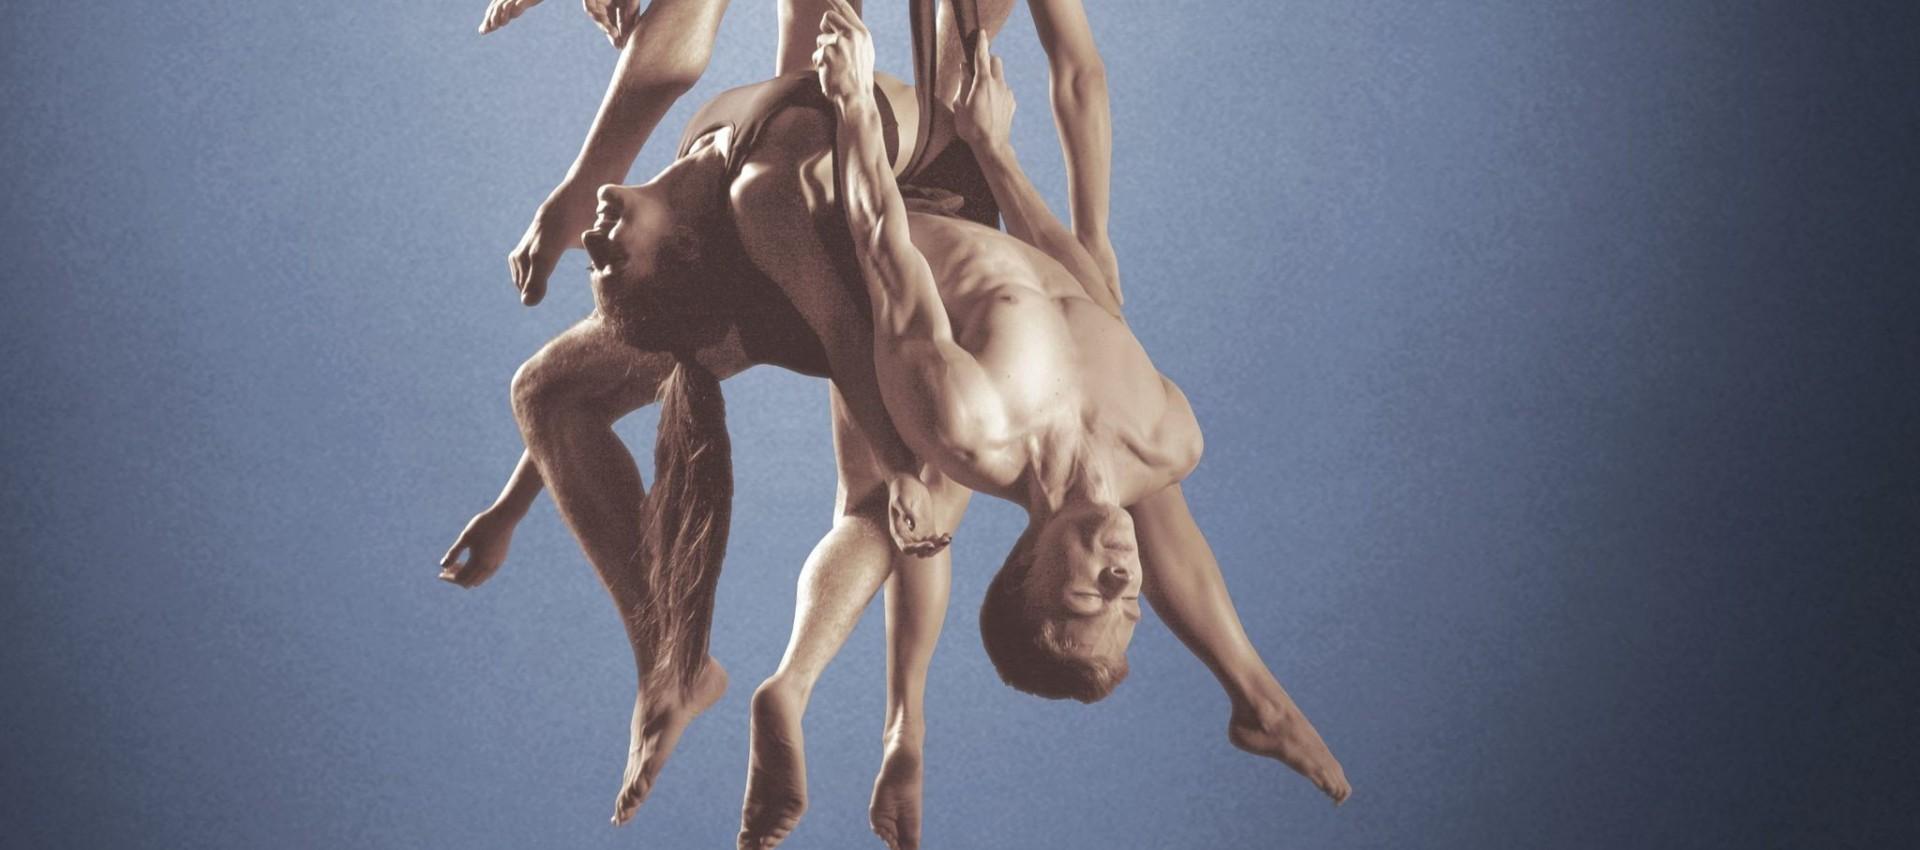 Recirquel Budapest: Solus Amor - premiere